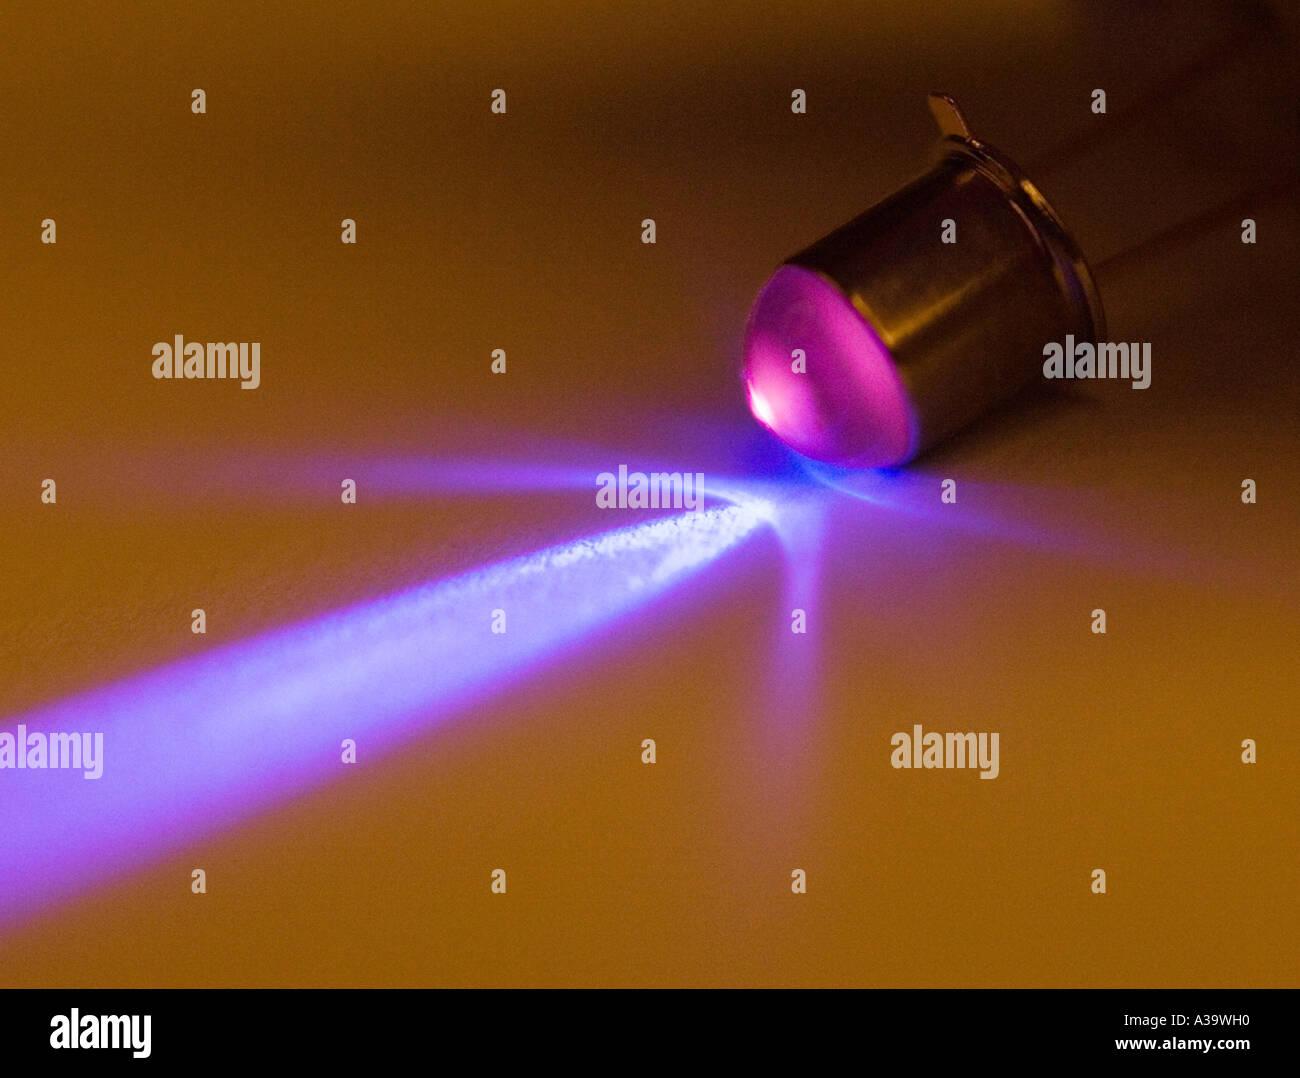 ultraviolet light emitting diode Stock Photo